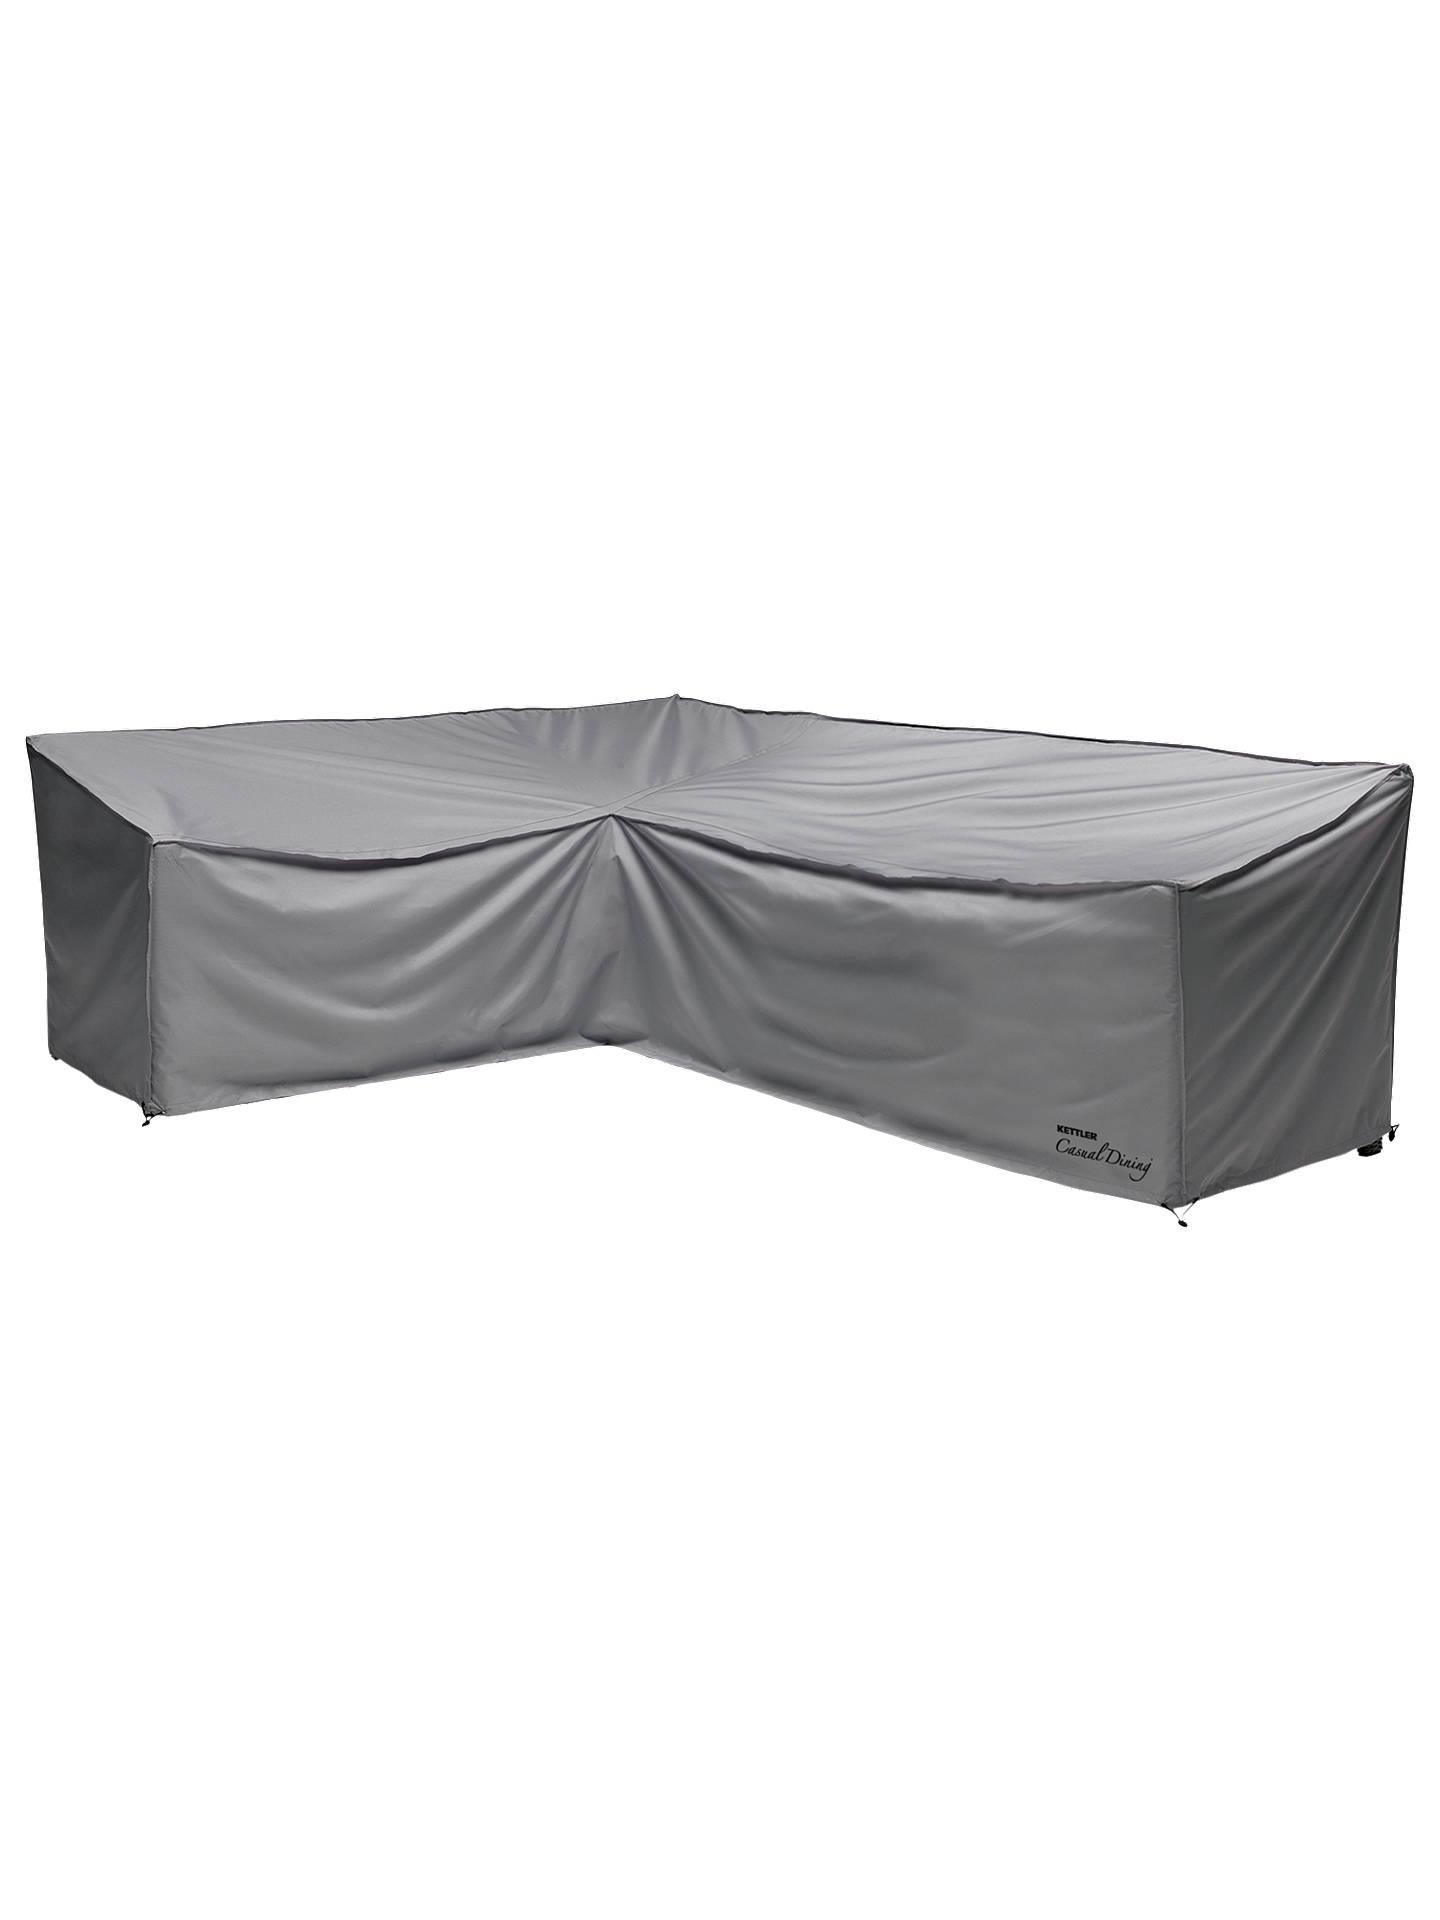 Kettler Palma Outdoor Corner Sofa Cover Online At Johnlewis